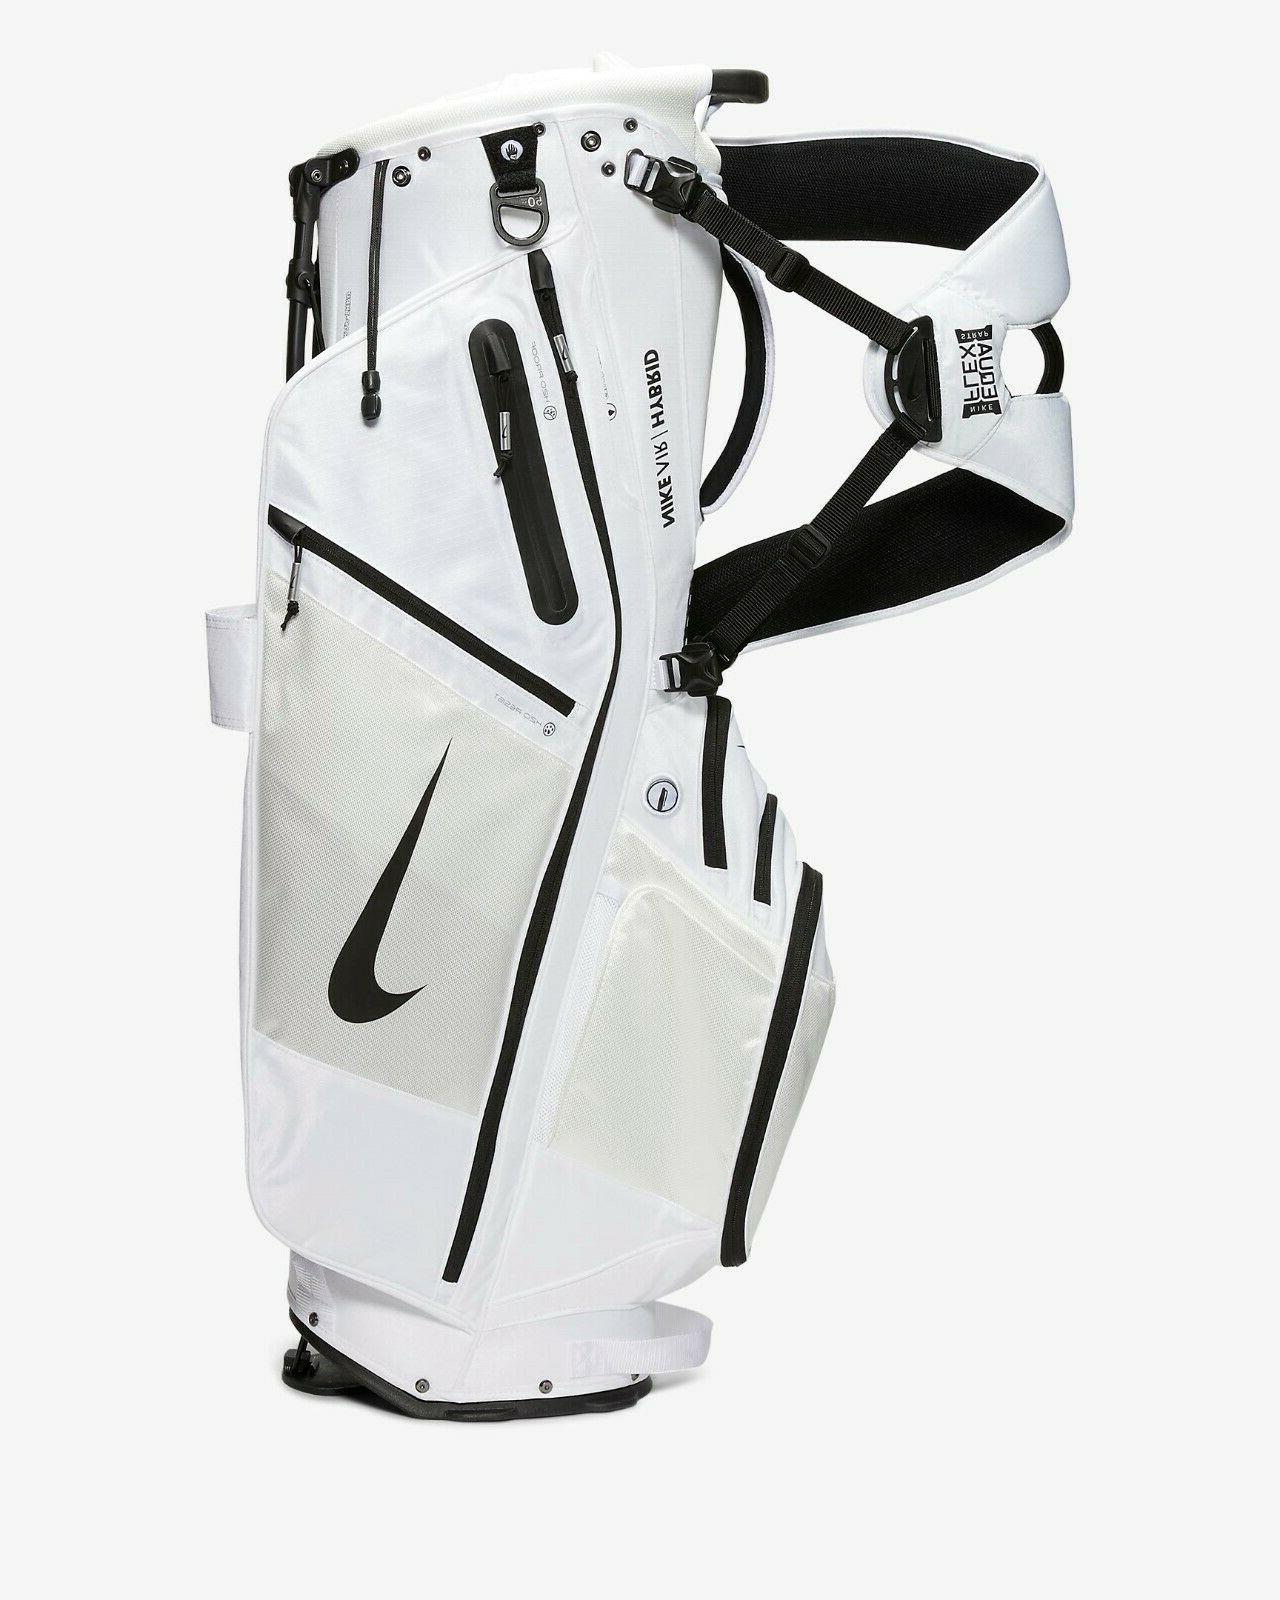 sold out 2020 air hybrid golf bag